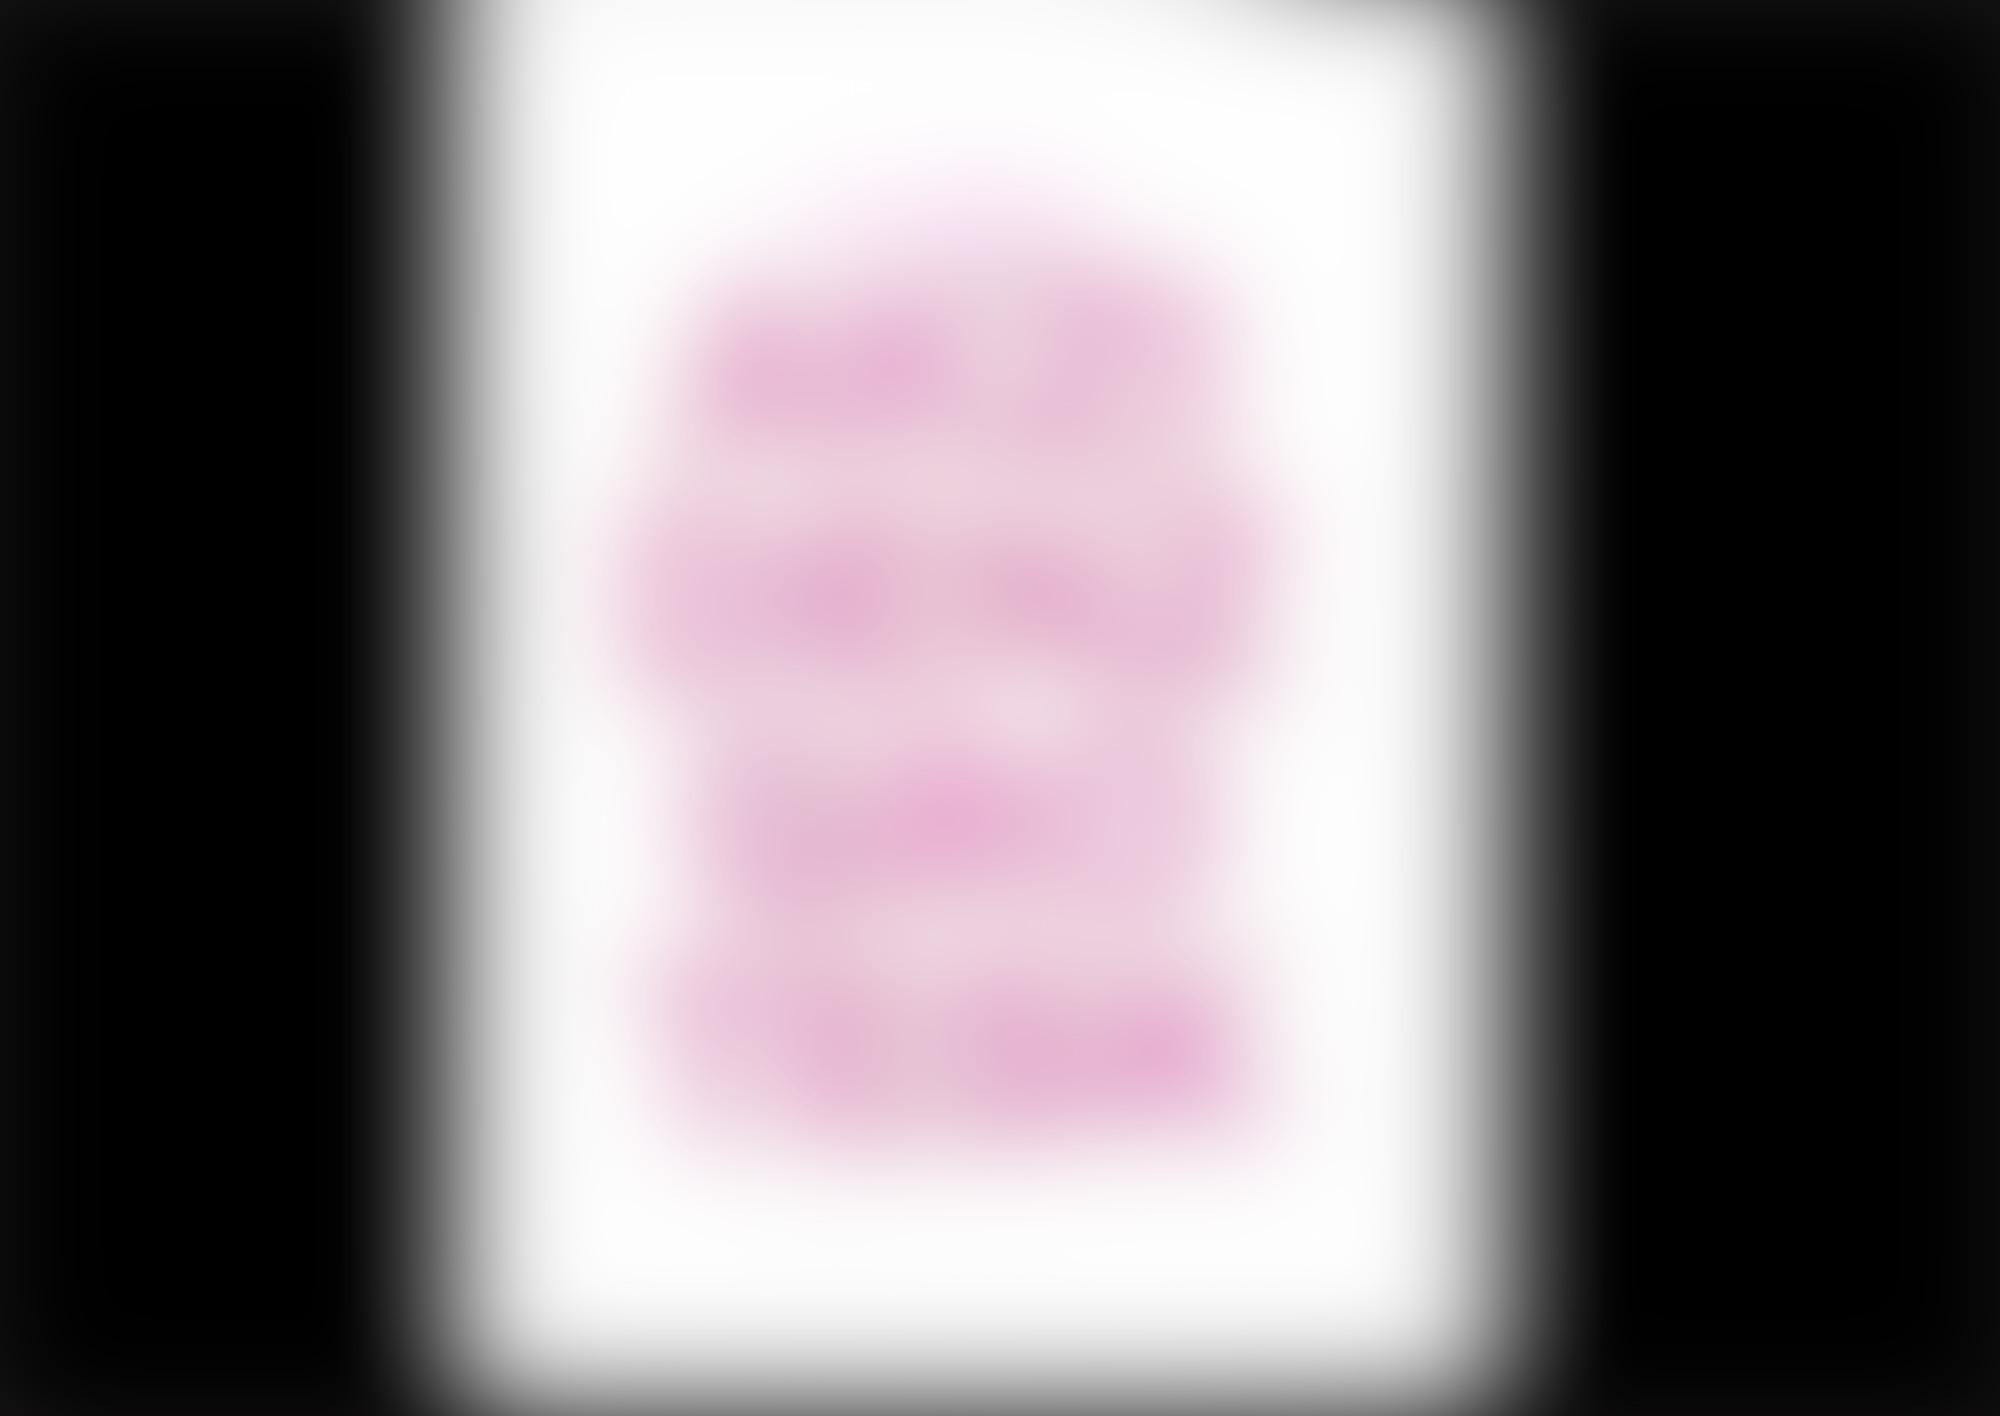 Etta voorsanger brill freelancing lectureinprogress 06 200305 113817 autocompressfitresizeixlibphp 1 1 0max h2000max w3 D2000q80s554ba9687209f52a8c6a3ce05ed98a50